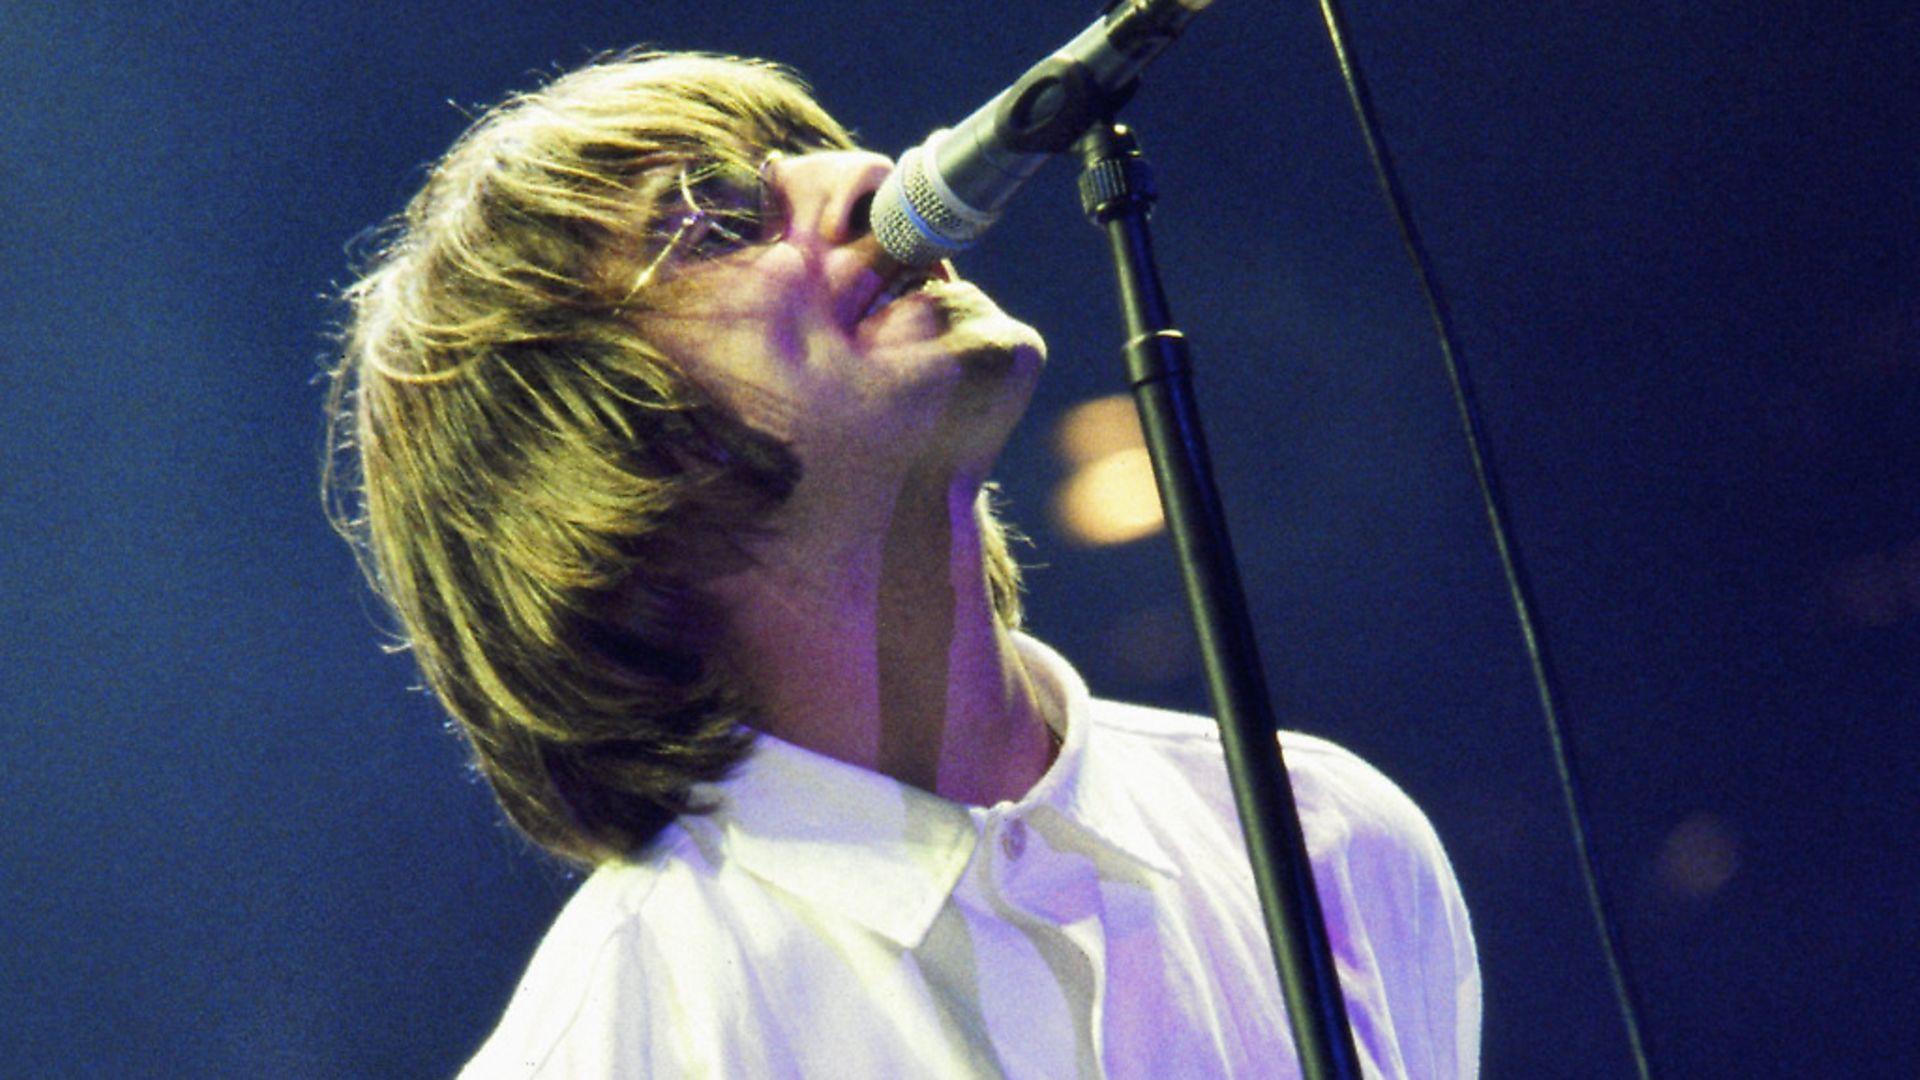 Liam Gallagher on stage at Knebworth. Photo: Simon Ritter/Redferns - Credit: Redferns